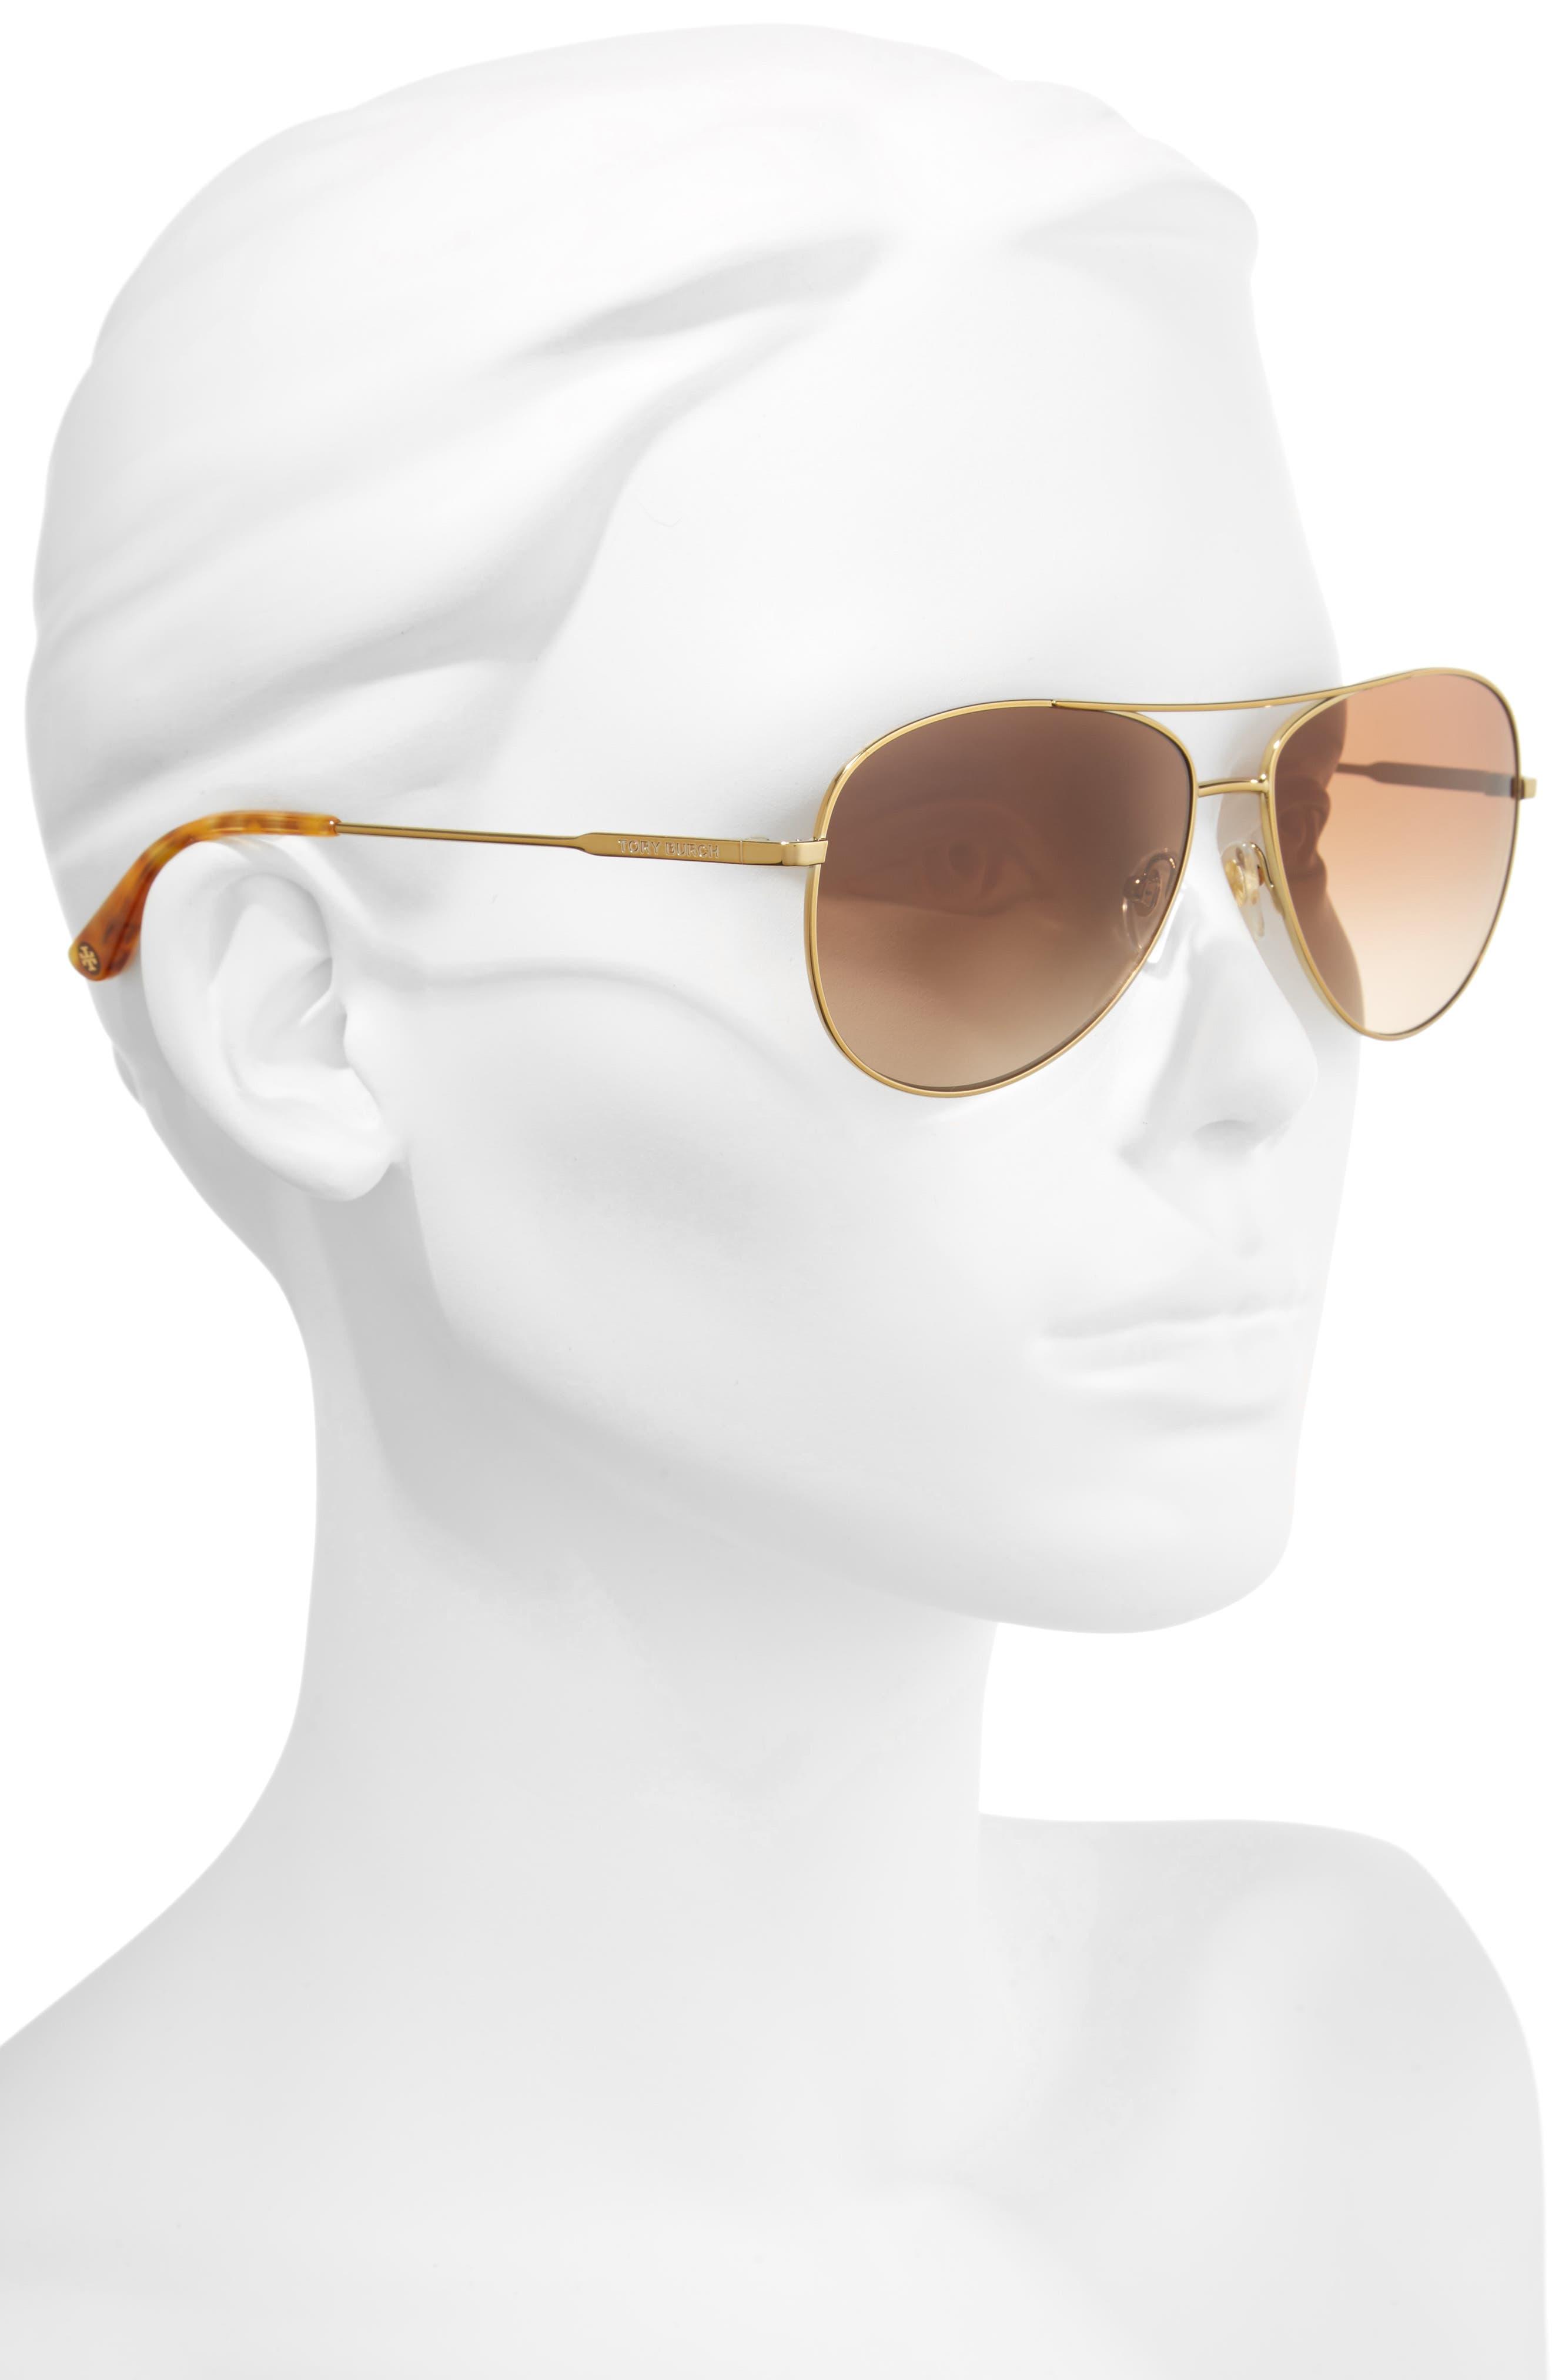 TORY BURCH, 59mm Metal Aviator Sunglasses, Alternate thumbnail 3, color, 710